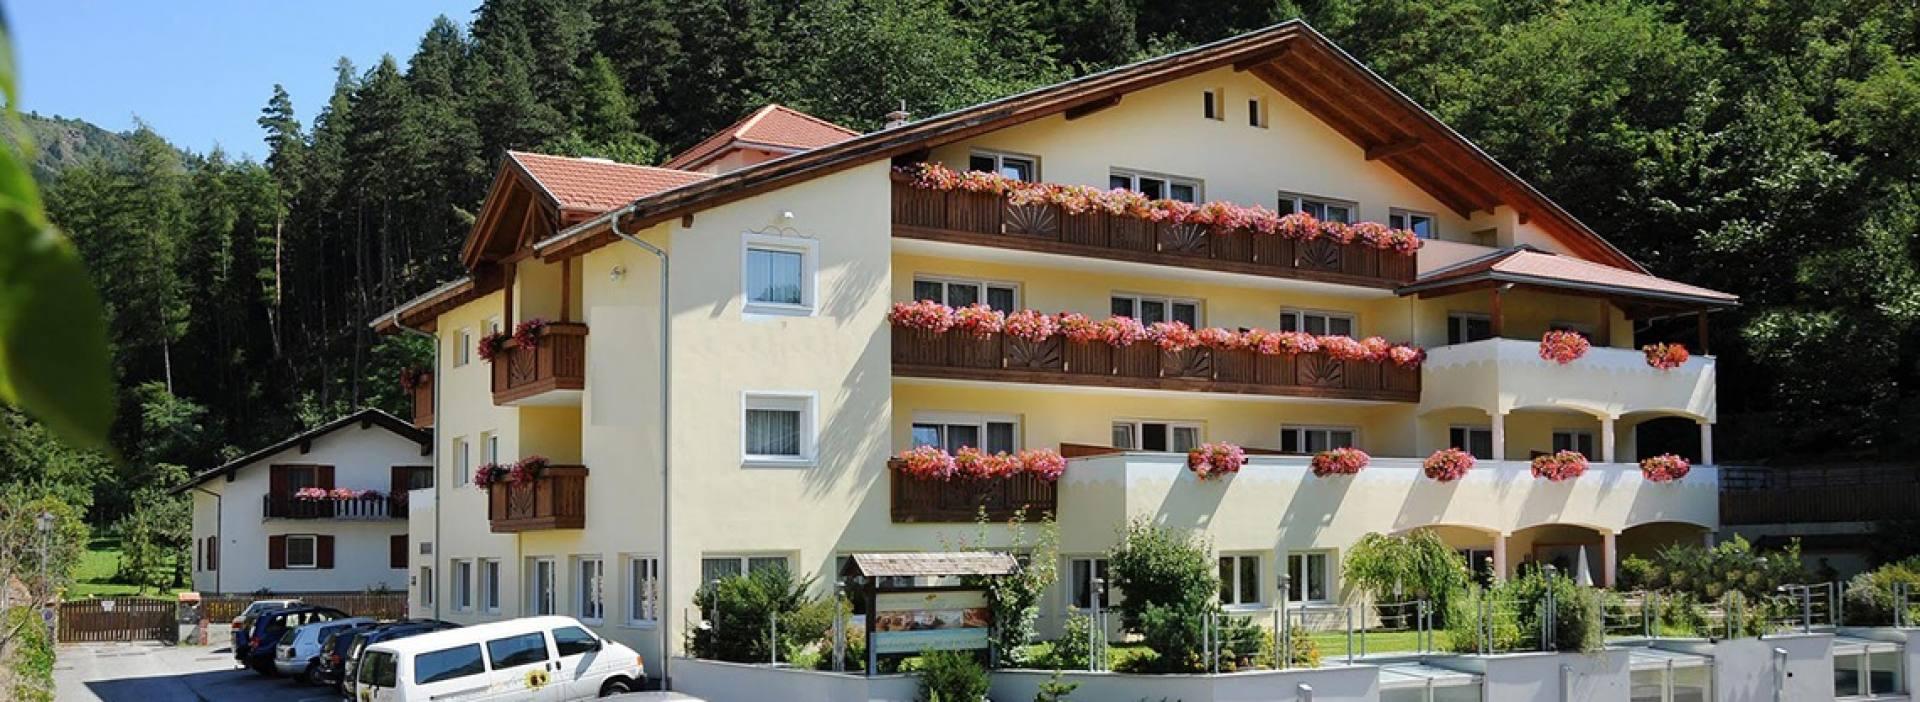 Saldur Small Active Hotel